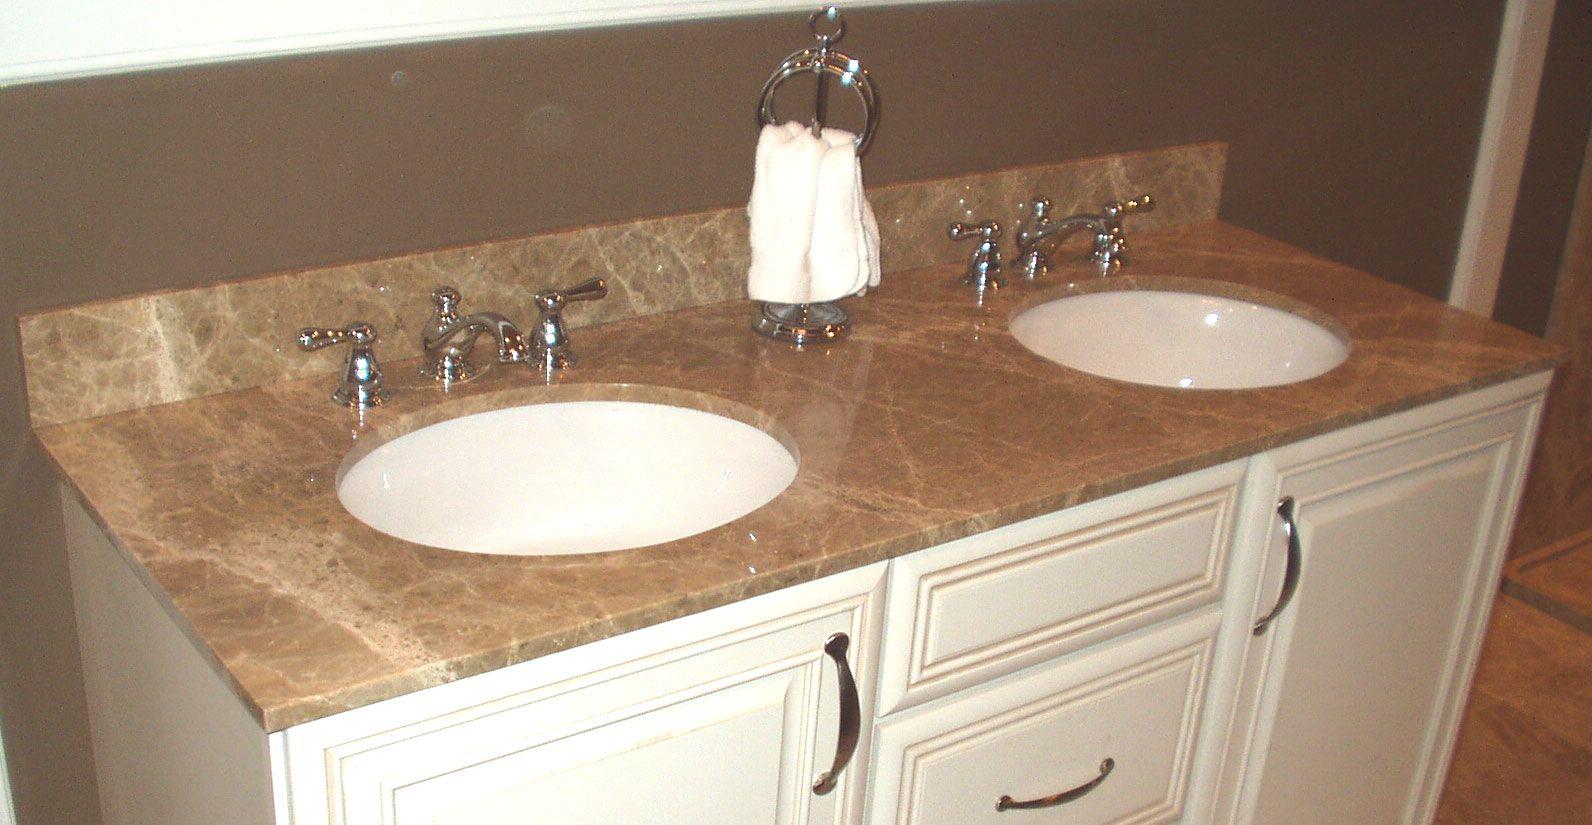 Countertop for bathroom vanities finito premium granite vanity tops that are in stock in eight designer